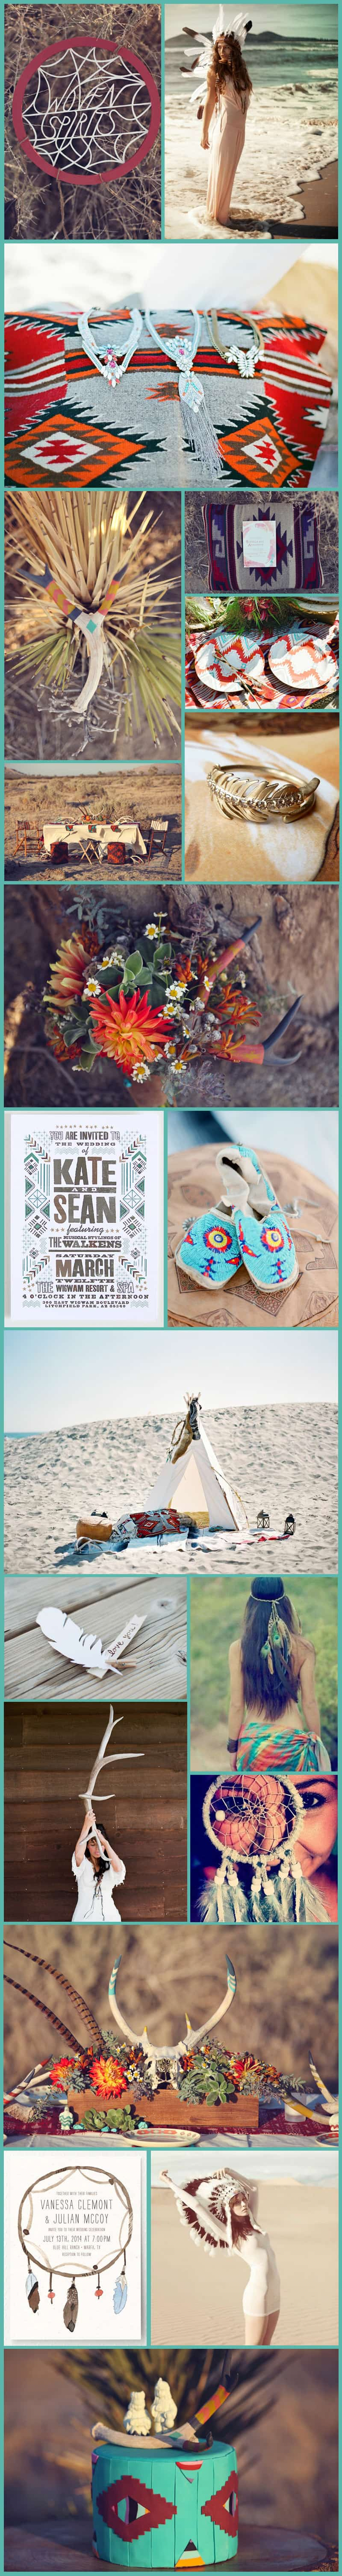 Native American Wedding Inspiration Board